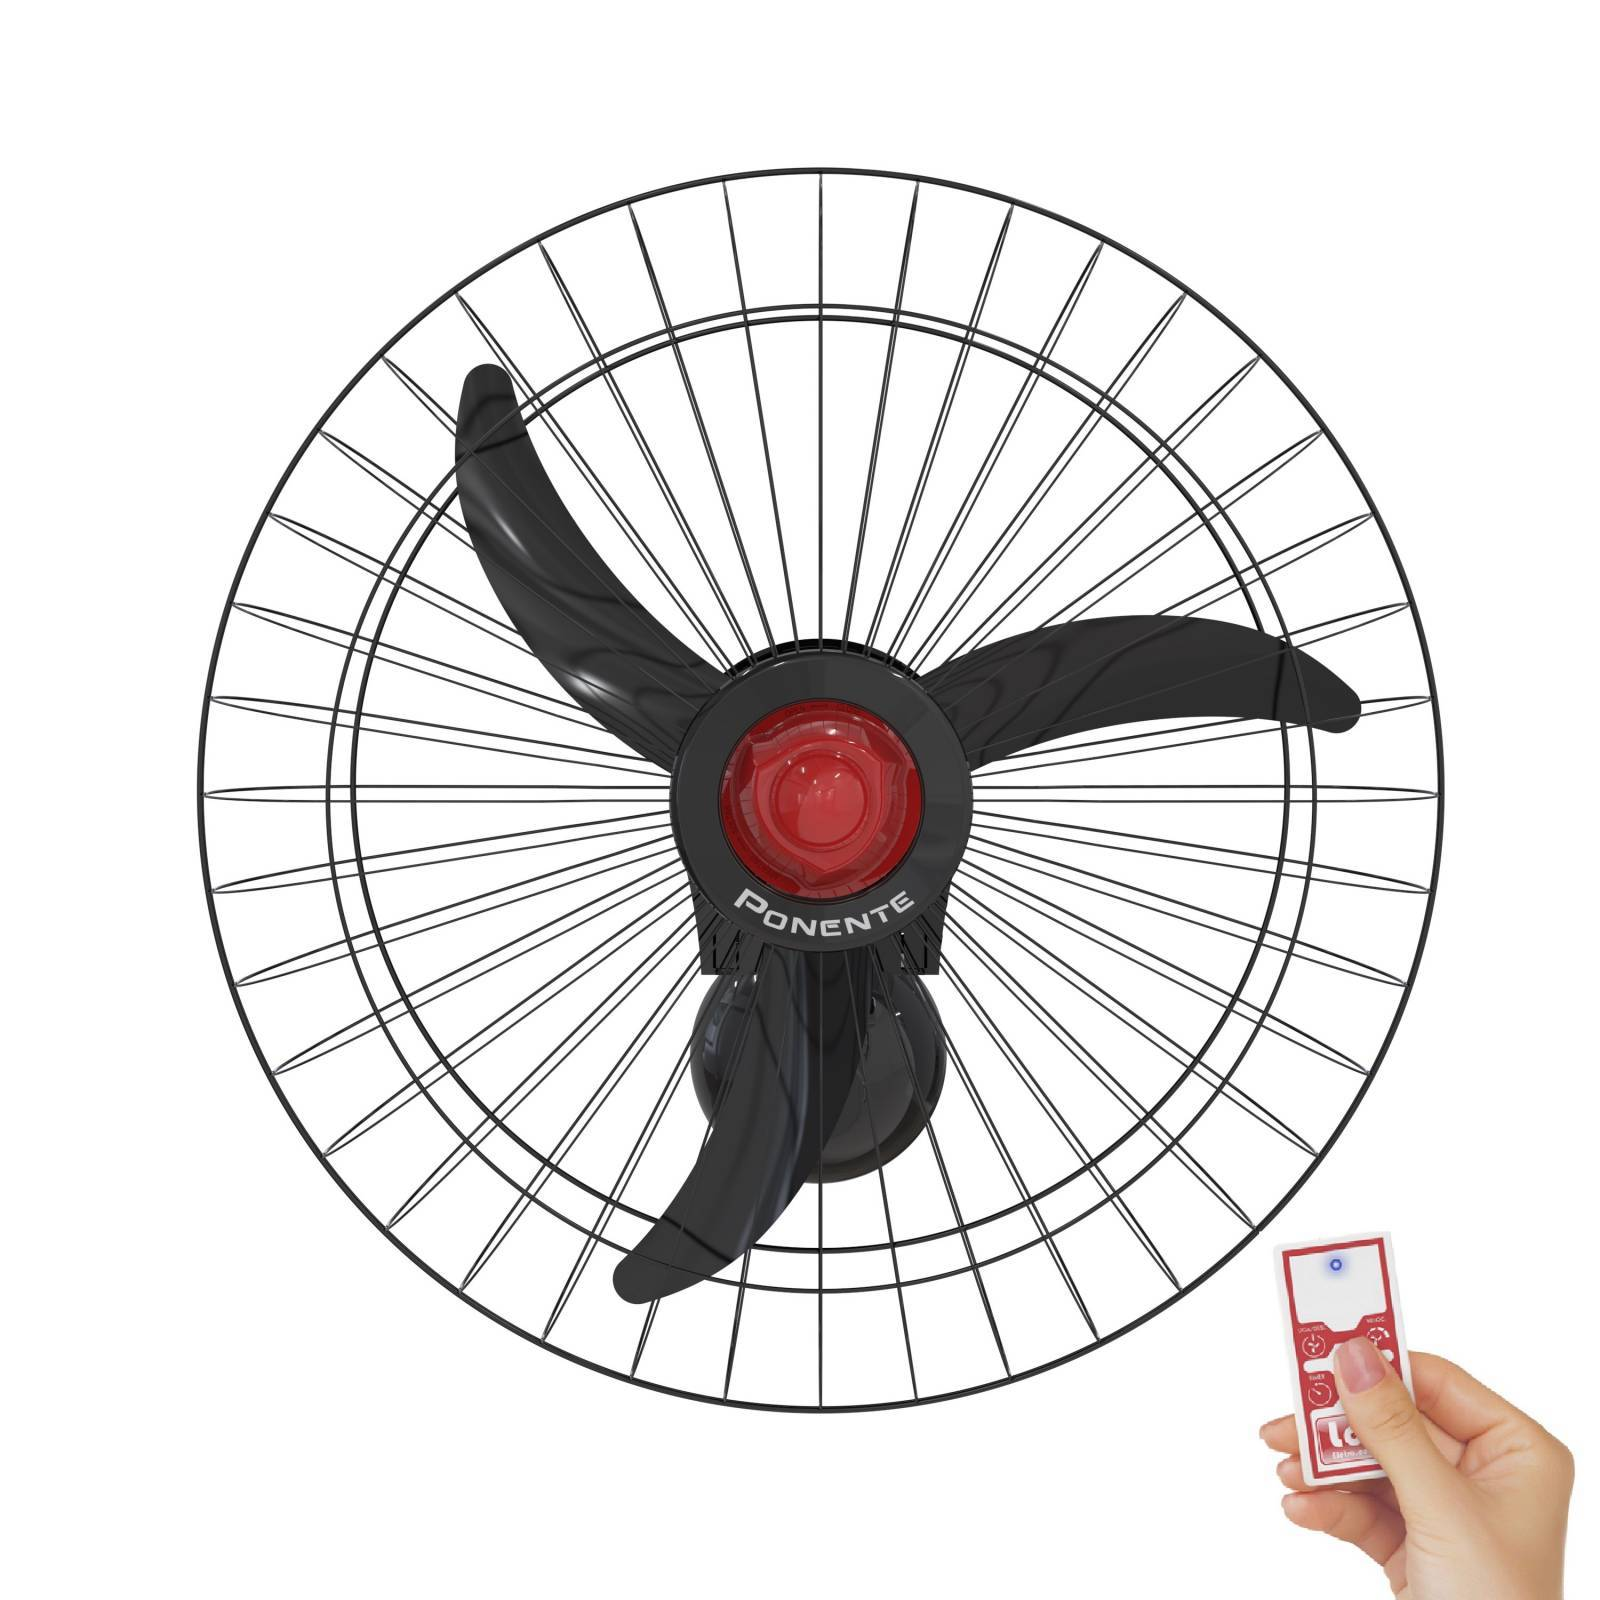 Ventilador De Parede 60cm Preto Ponente 200w Controle Remoto - LCGELETRO